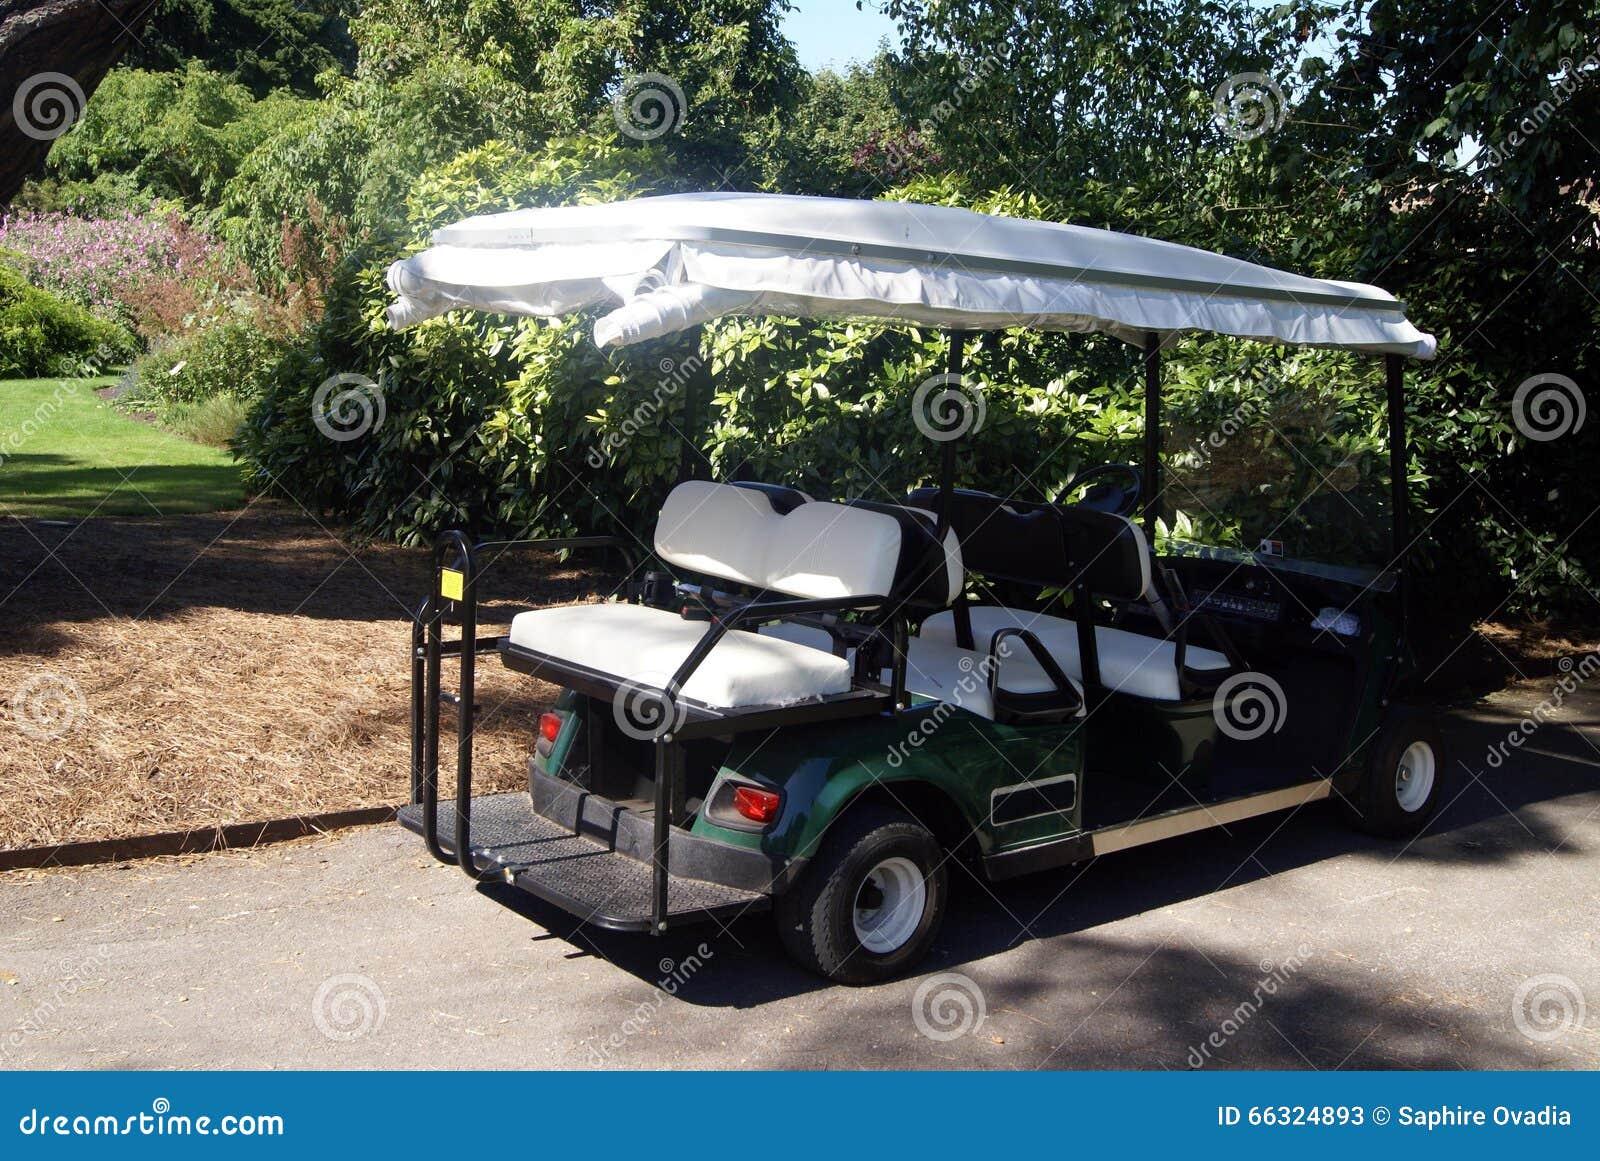 Golf Cart Light Specs on trailer specs, golf pull carts, golf push carts, food specs, golf warehouse carts, 2009 club car precedent specs,